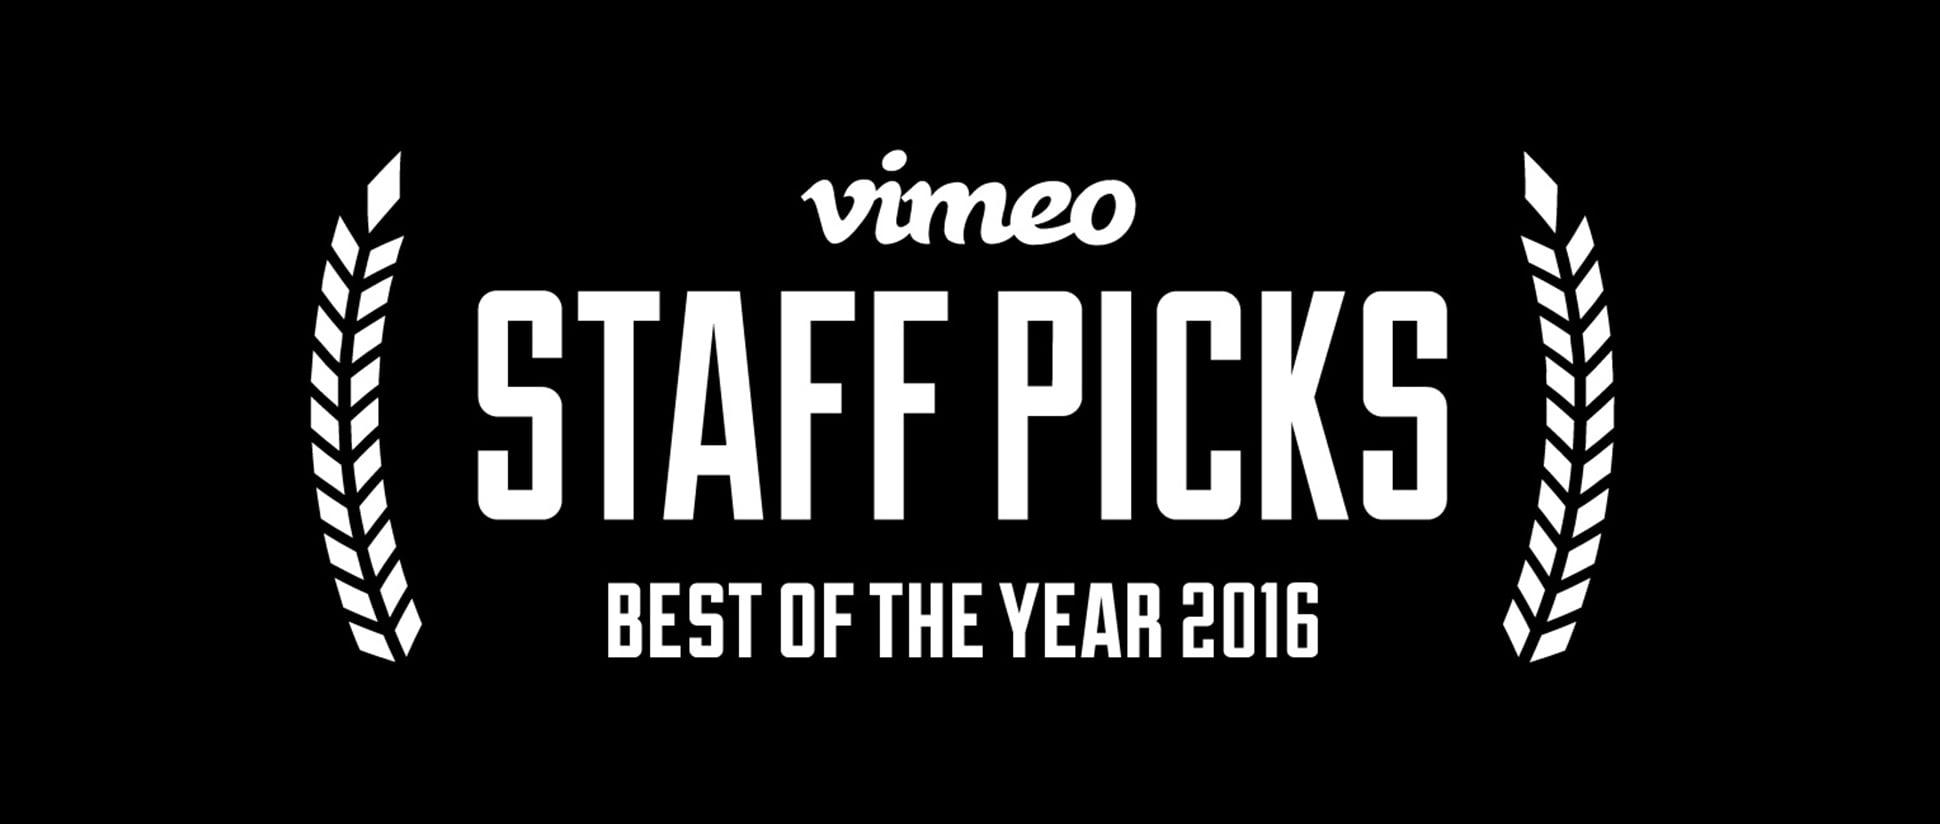 Vimeo presents: The top videos of 2016 - Vimeo Blog